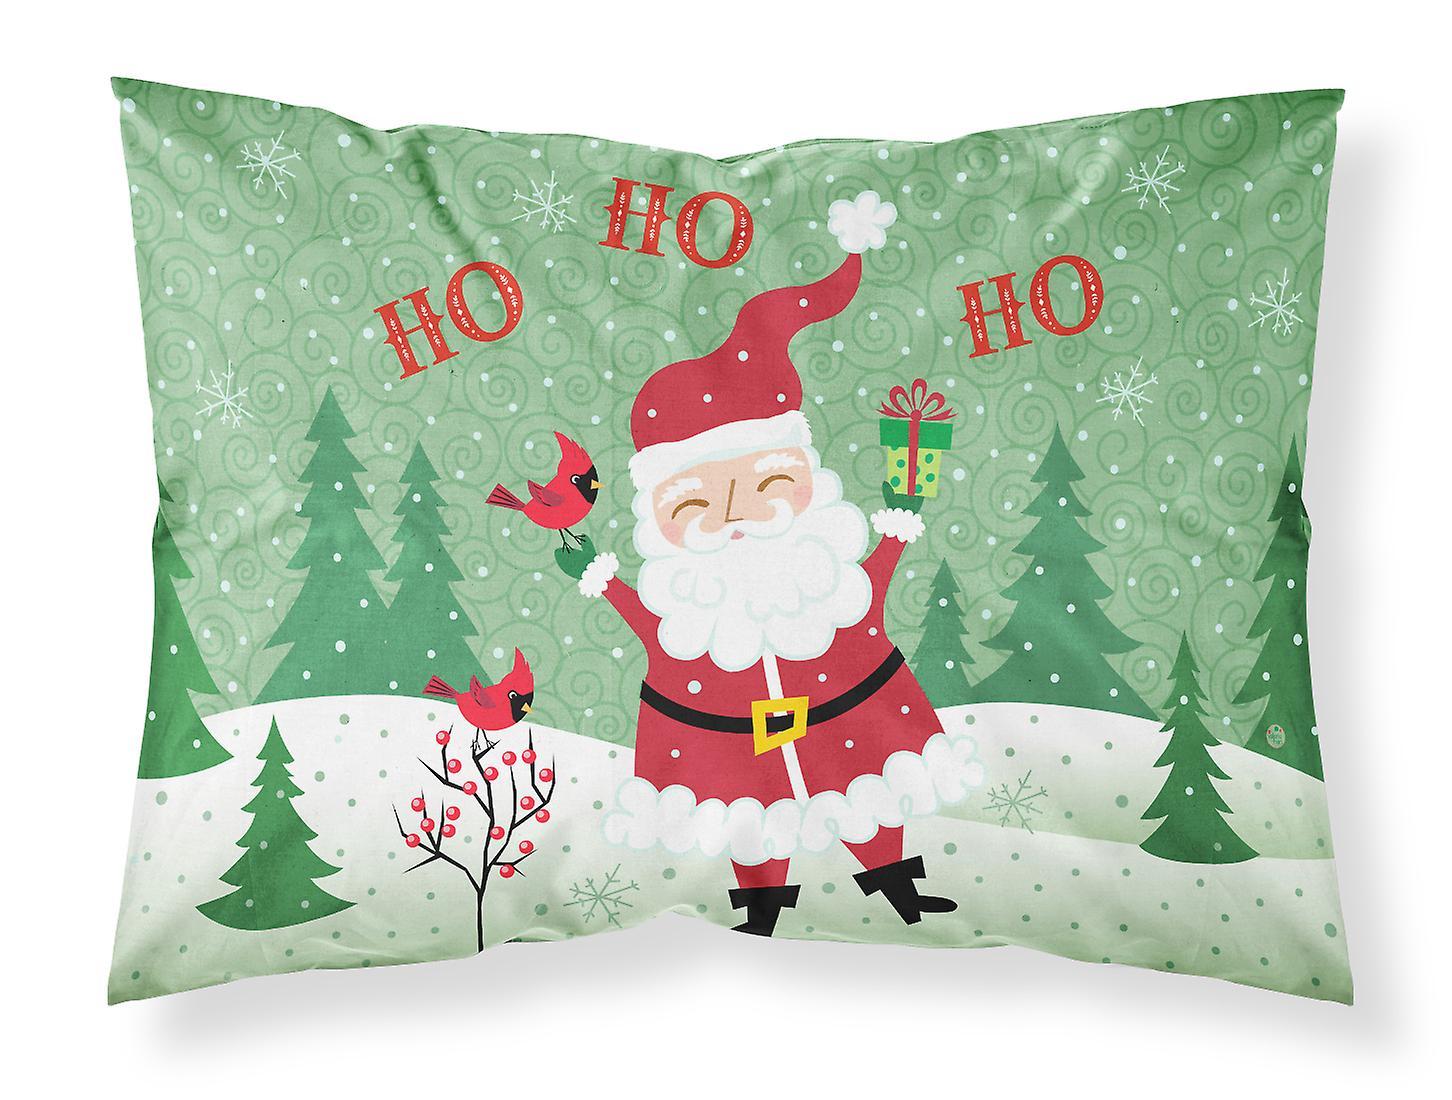 Frohe Weihnachten Santa Claus Ho Ho Ho Fabric Standard Kissenbezug ...